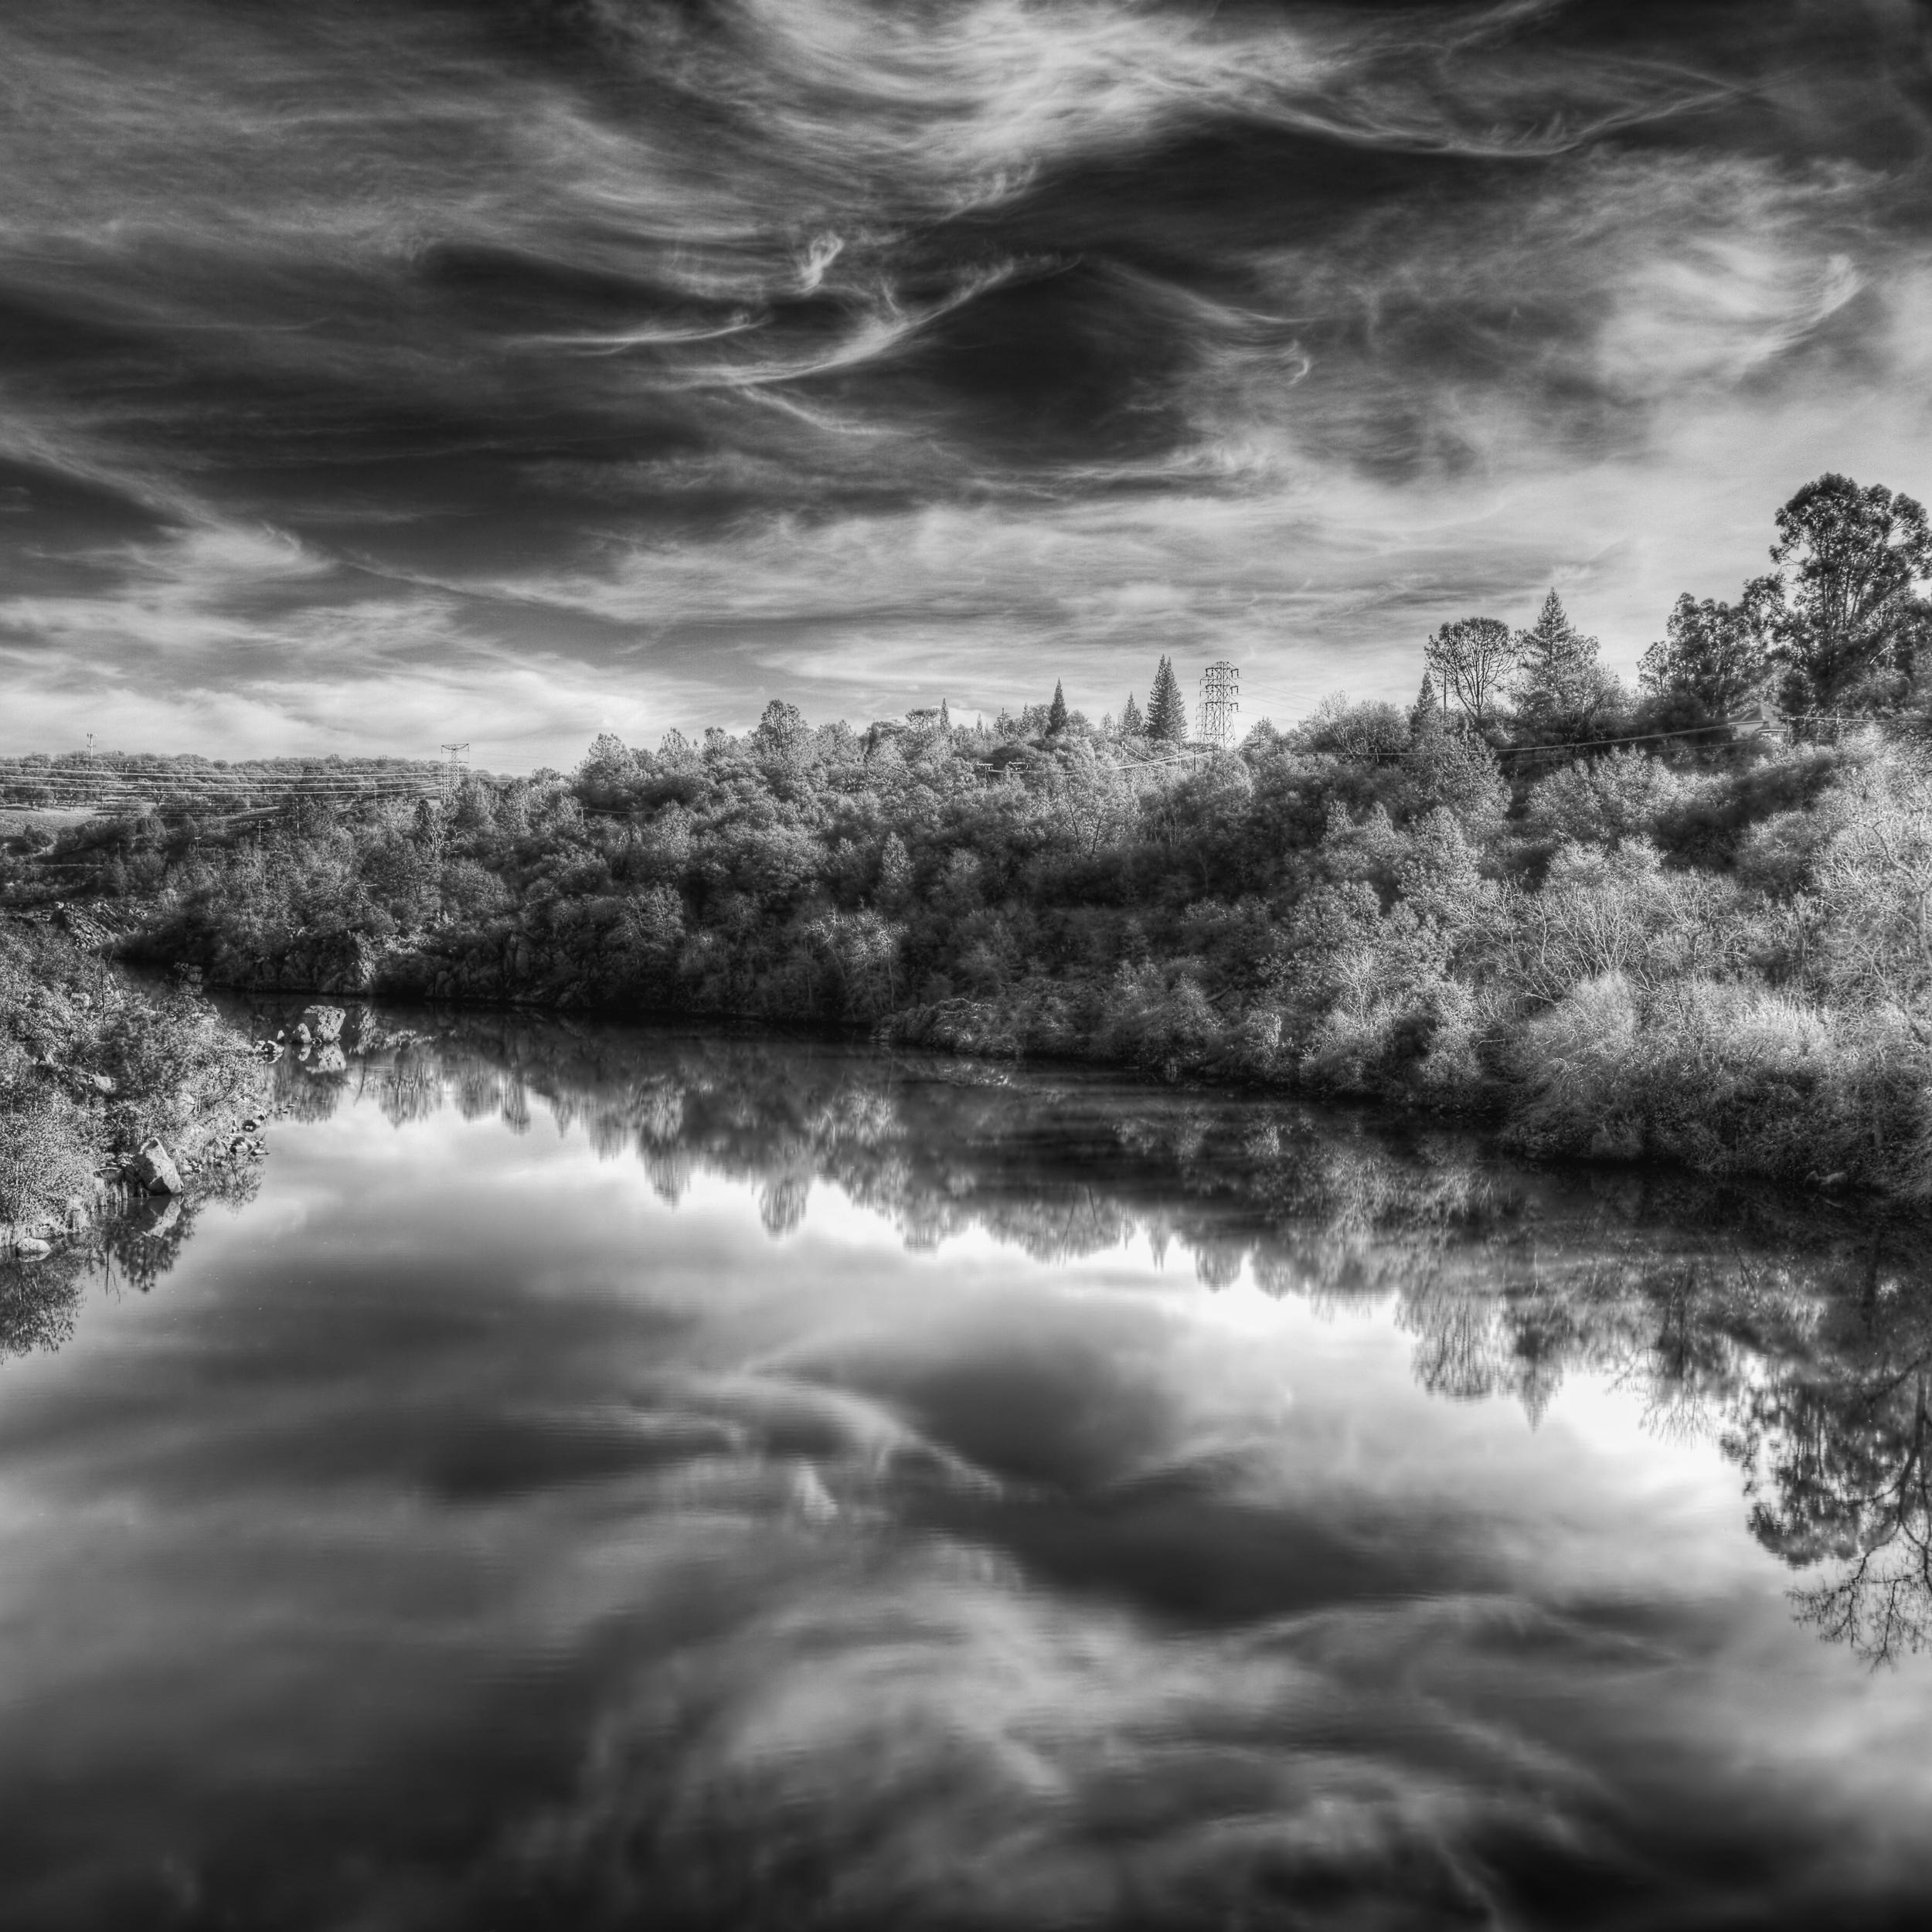 American River, Study 2